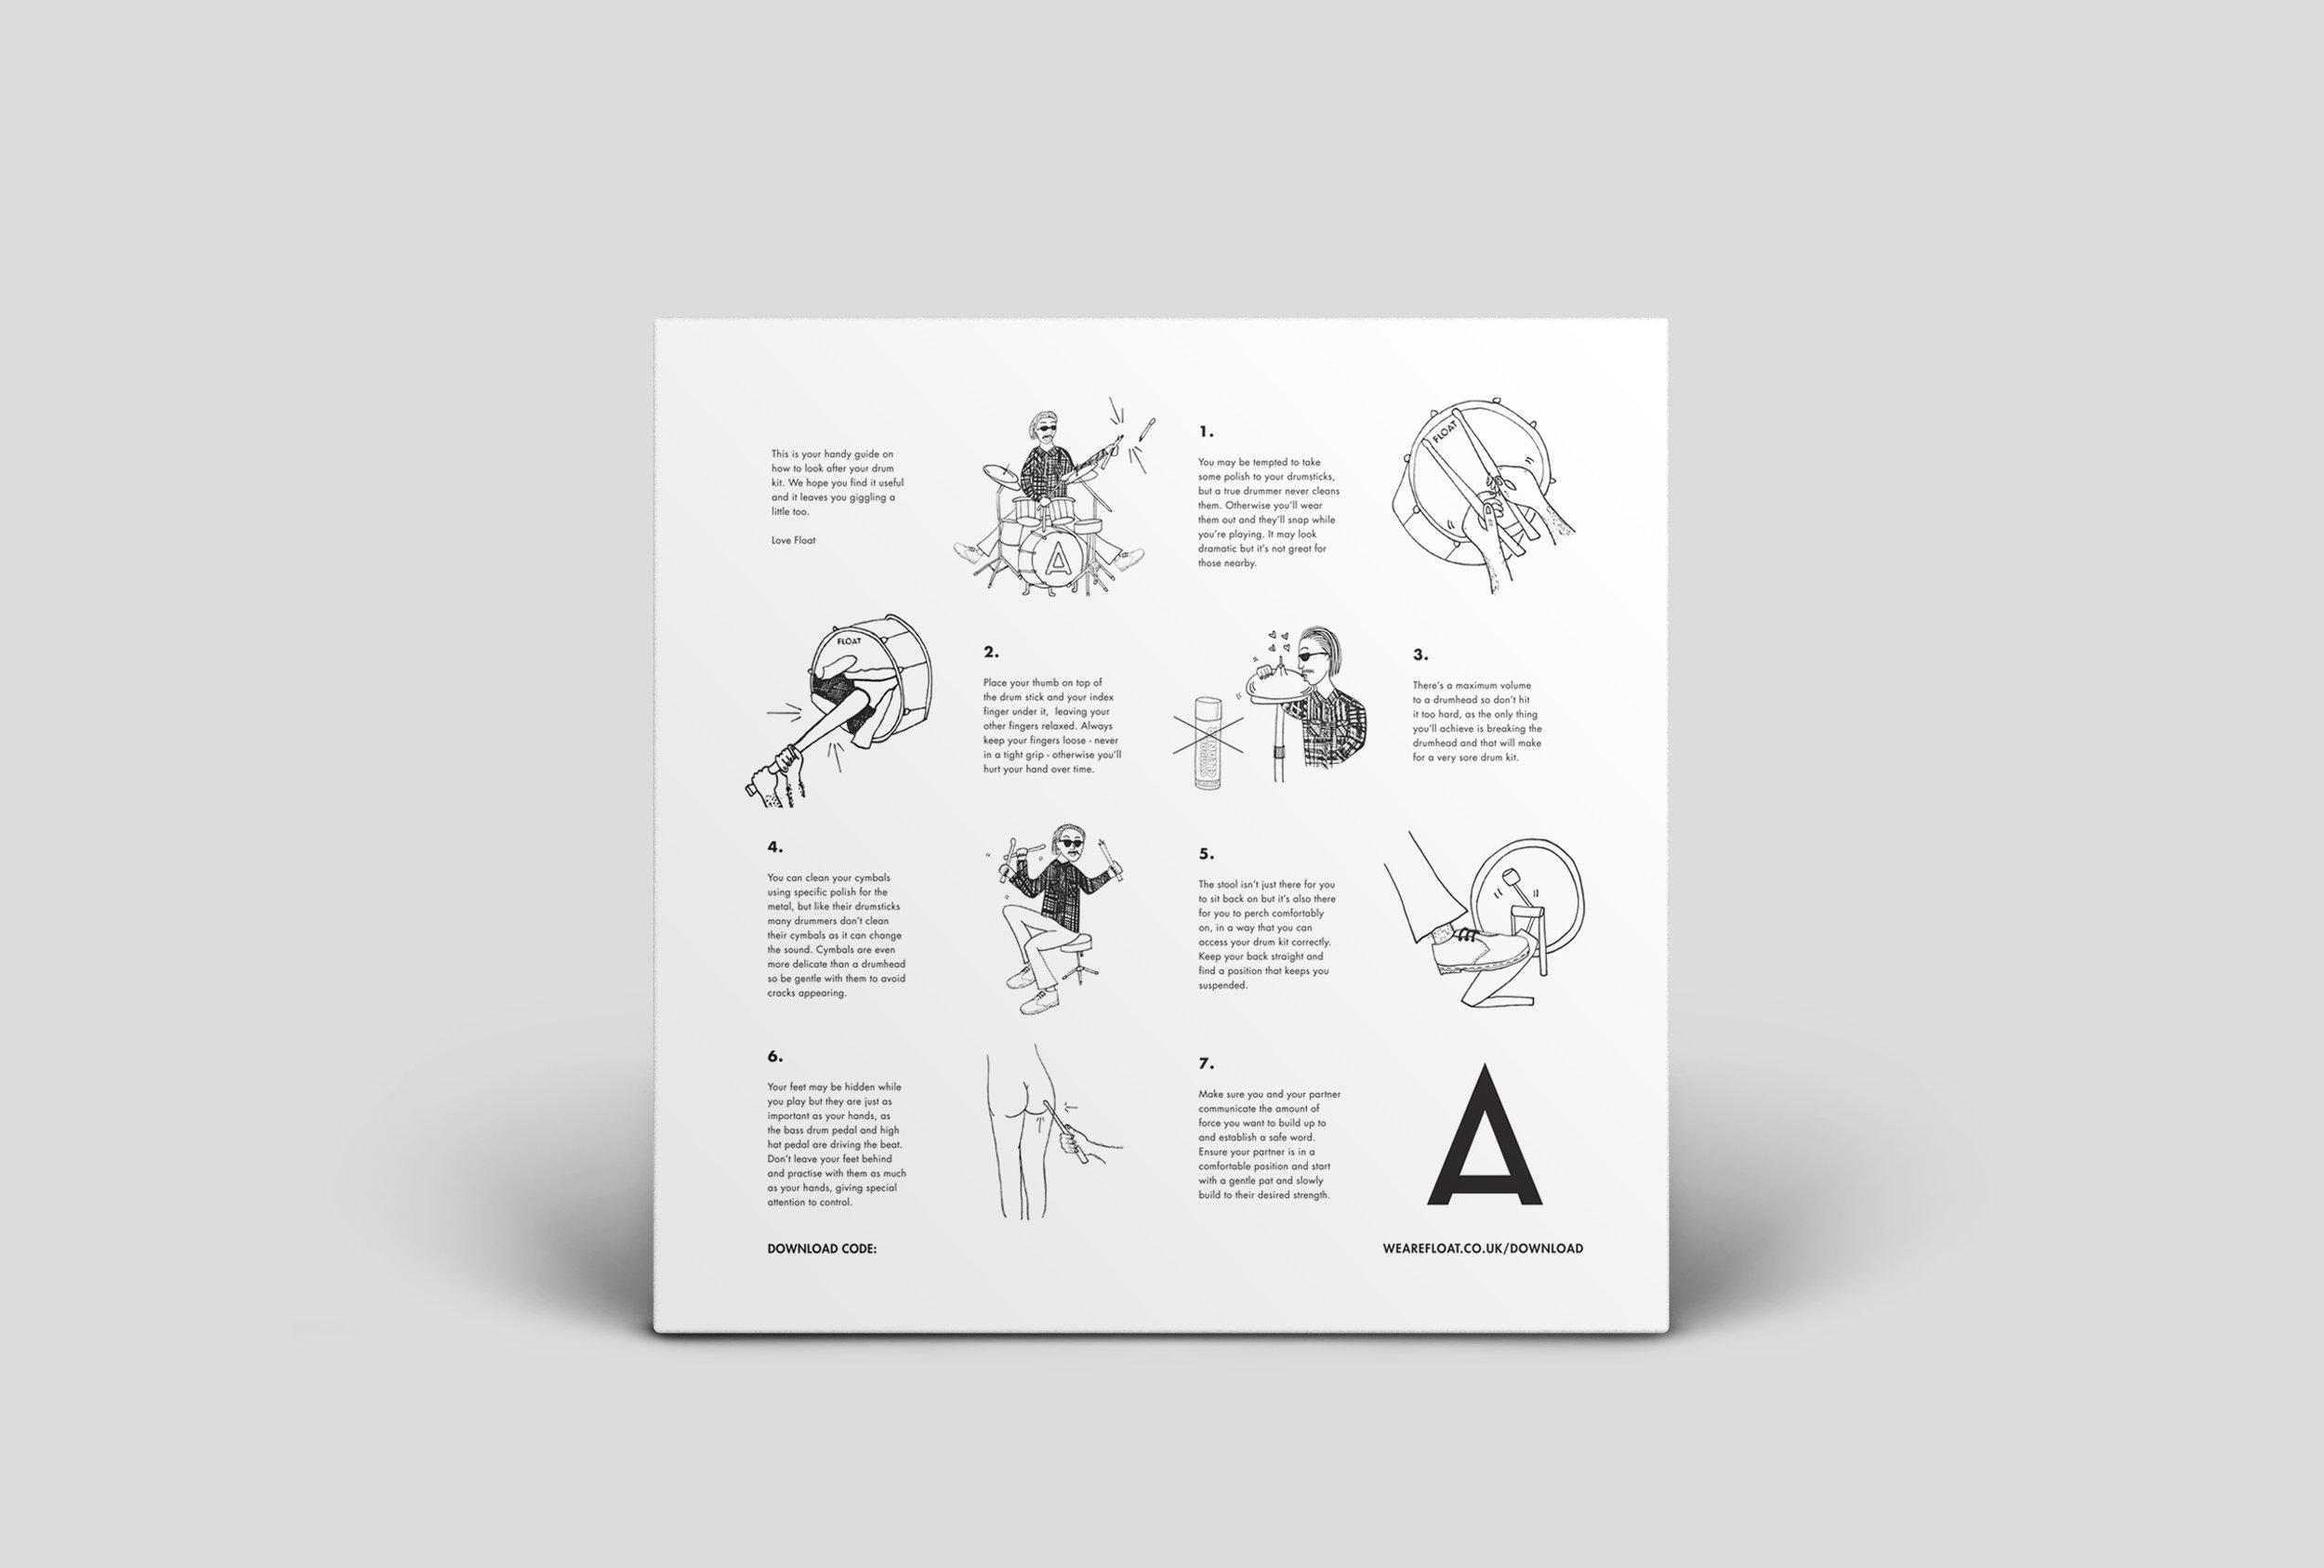 Andrea-Belfi_STRATA_vinyl-mock-up_guide.jpg